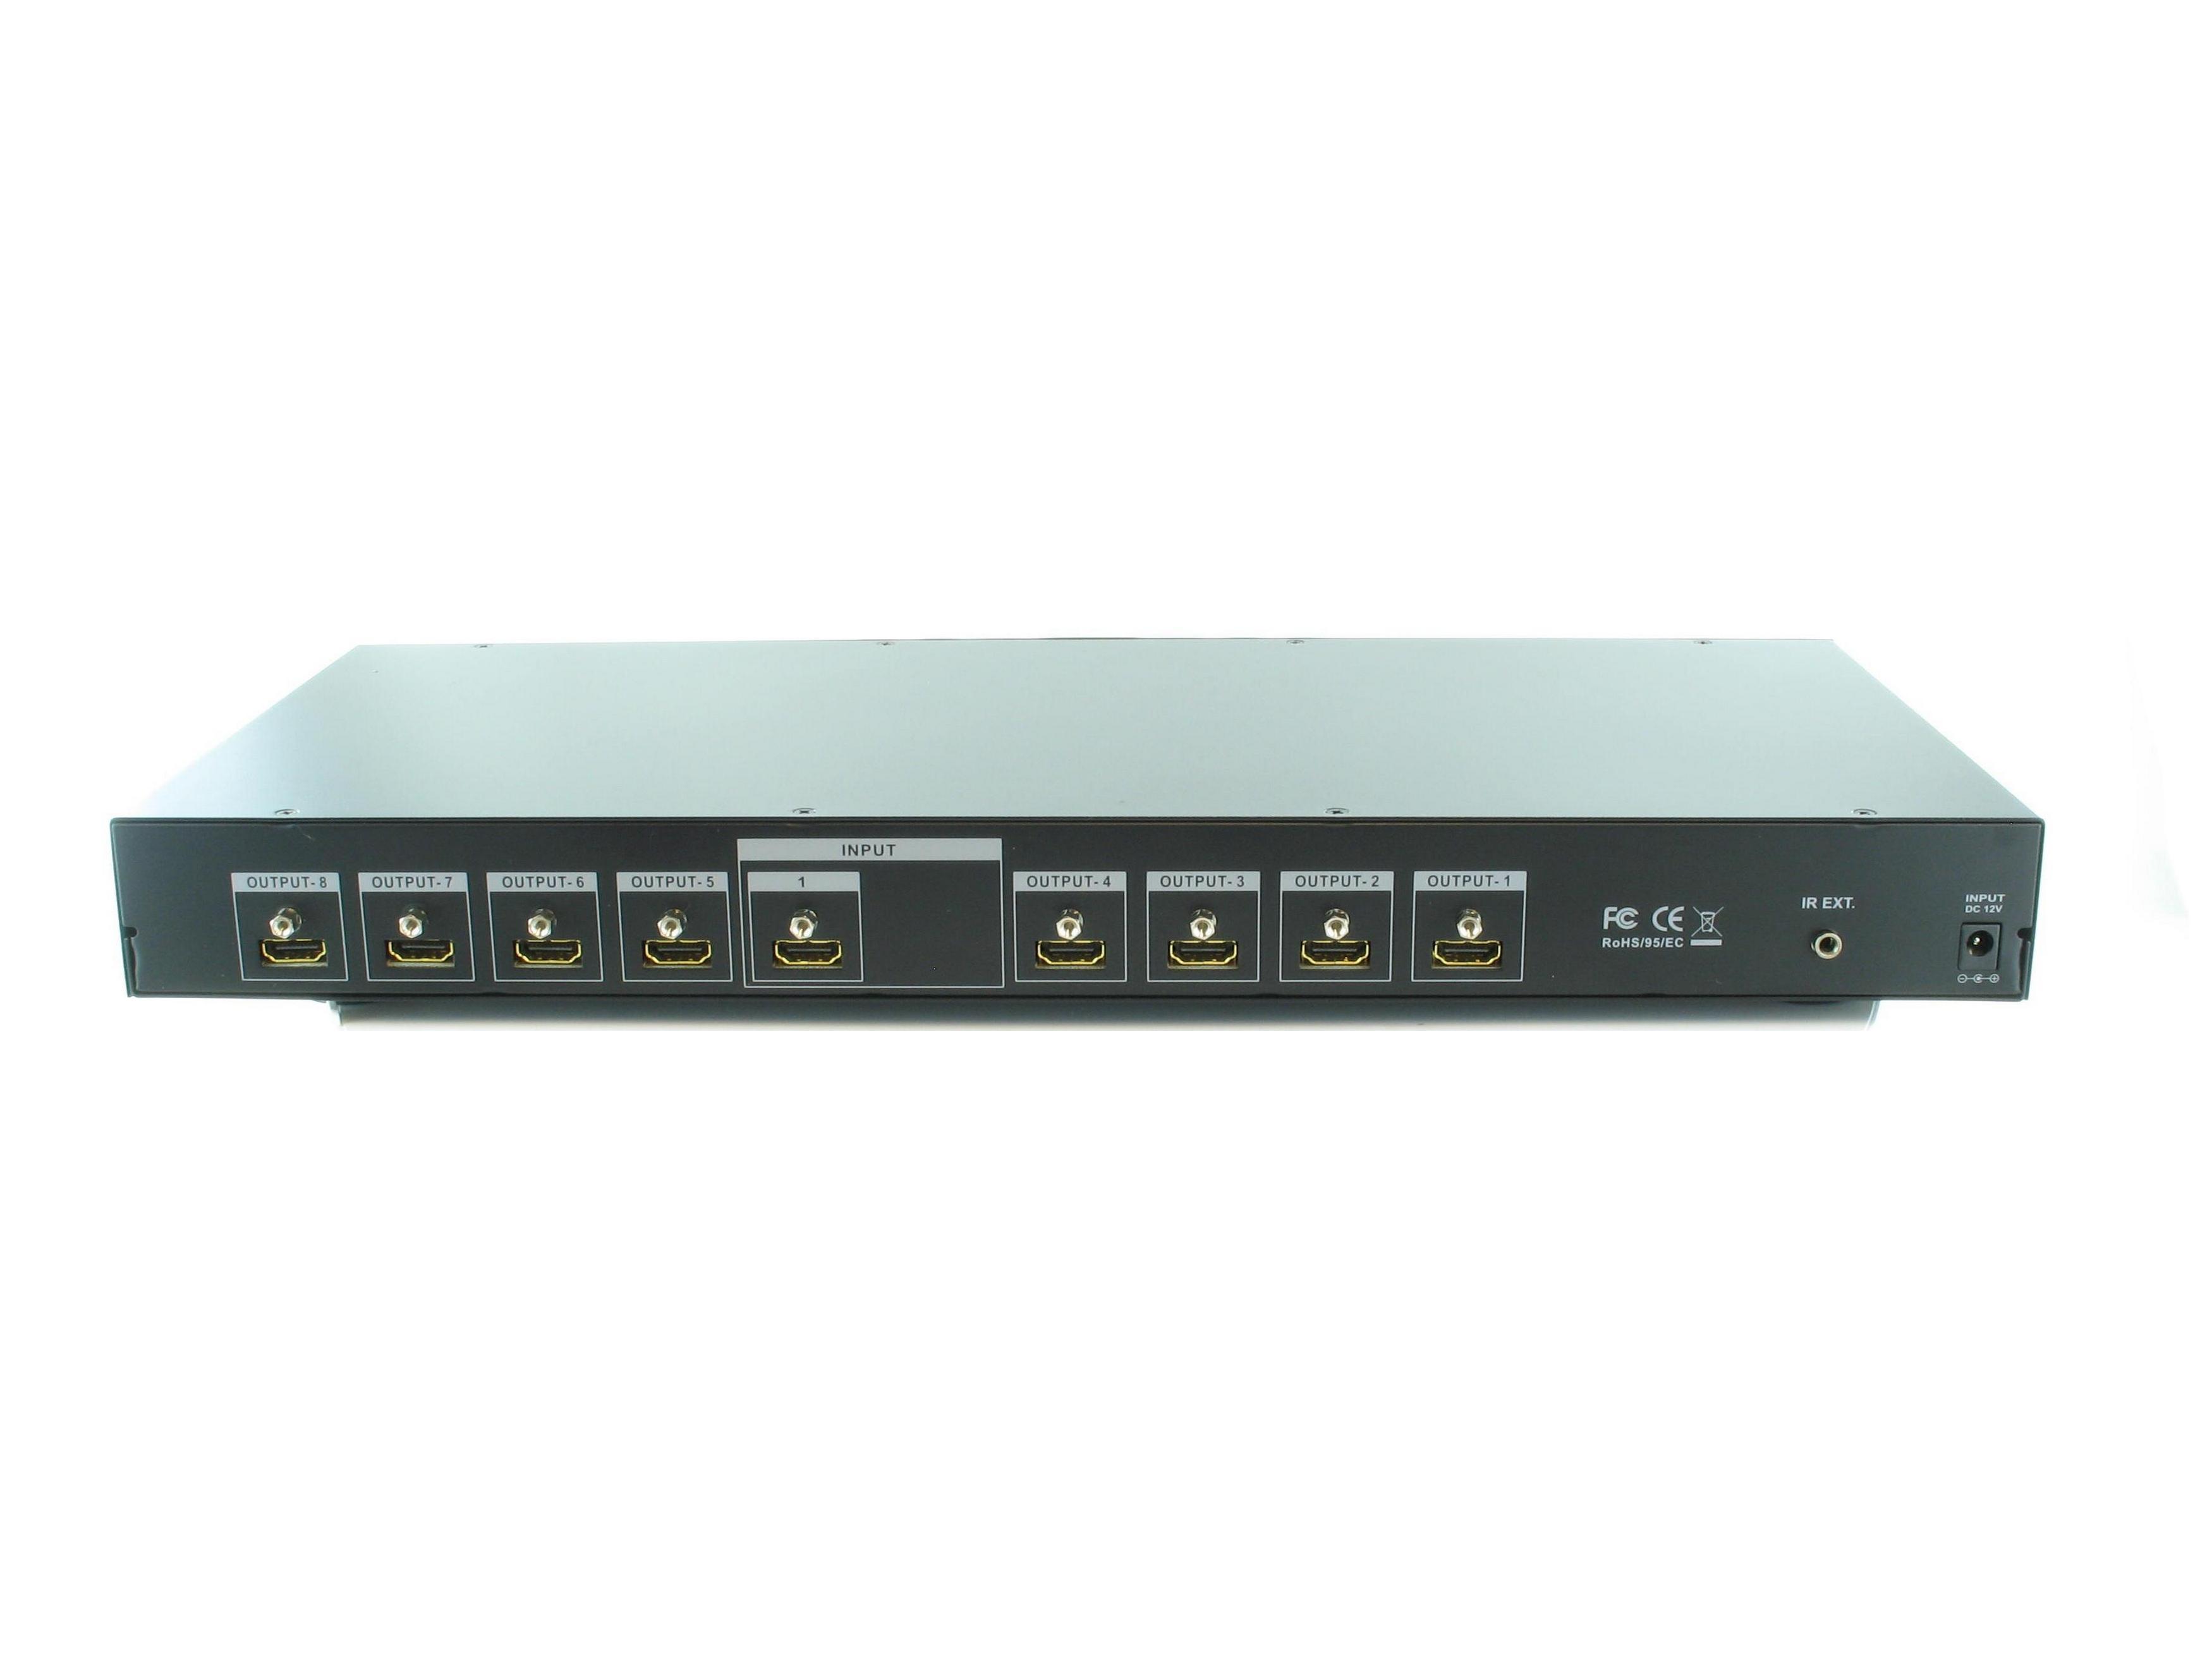 Shinybow SB-5658p 1:8 HDMI Distribution Amplifier V1.3c